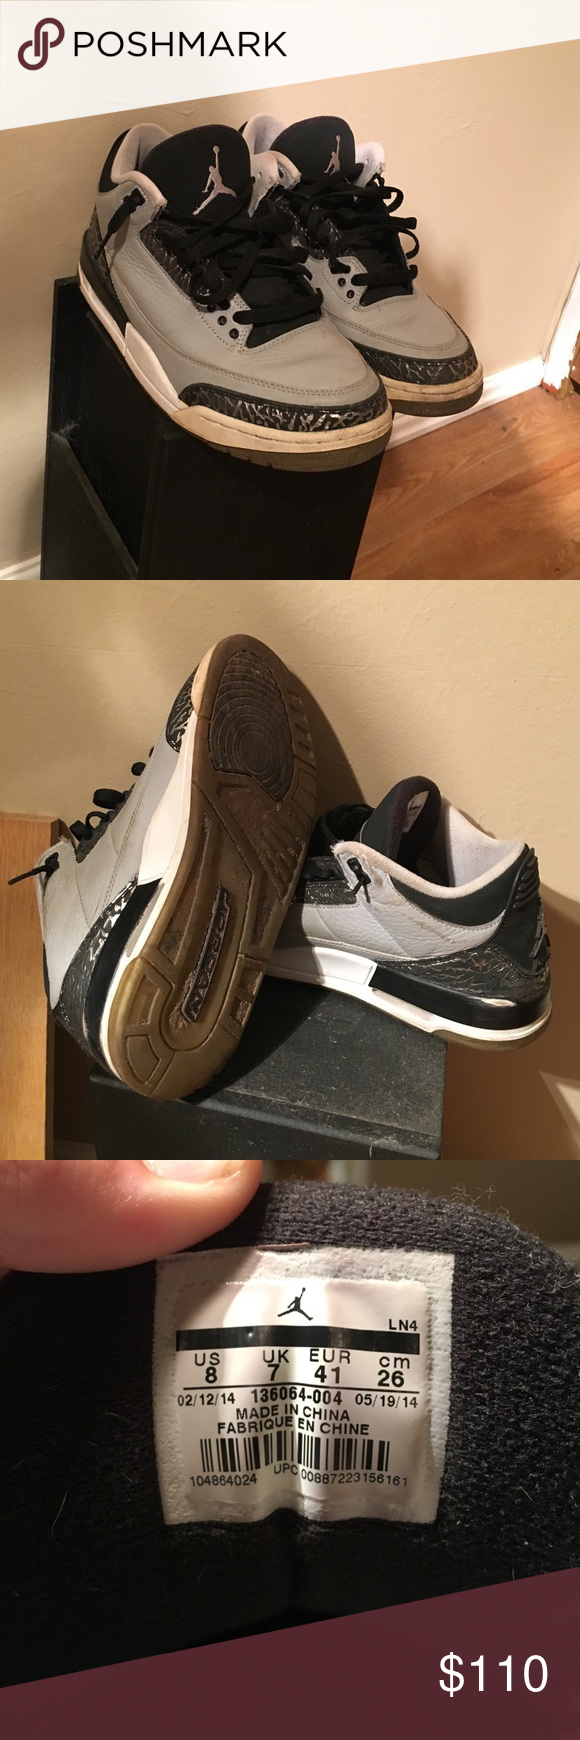 Air Jordan 3 Retro Wolf Grey in 2020 Louis vuitton shoes